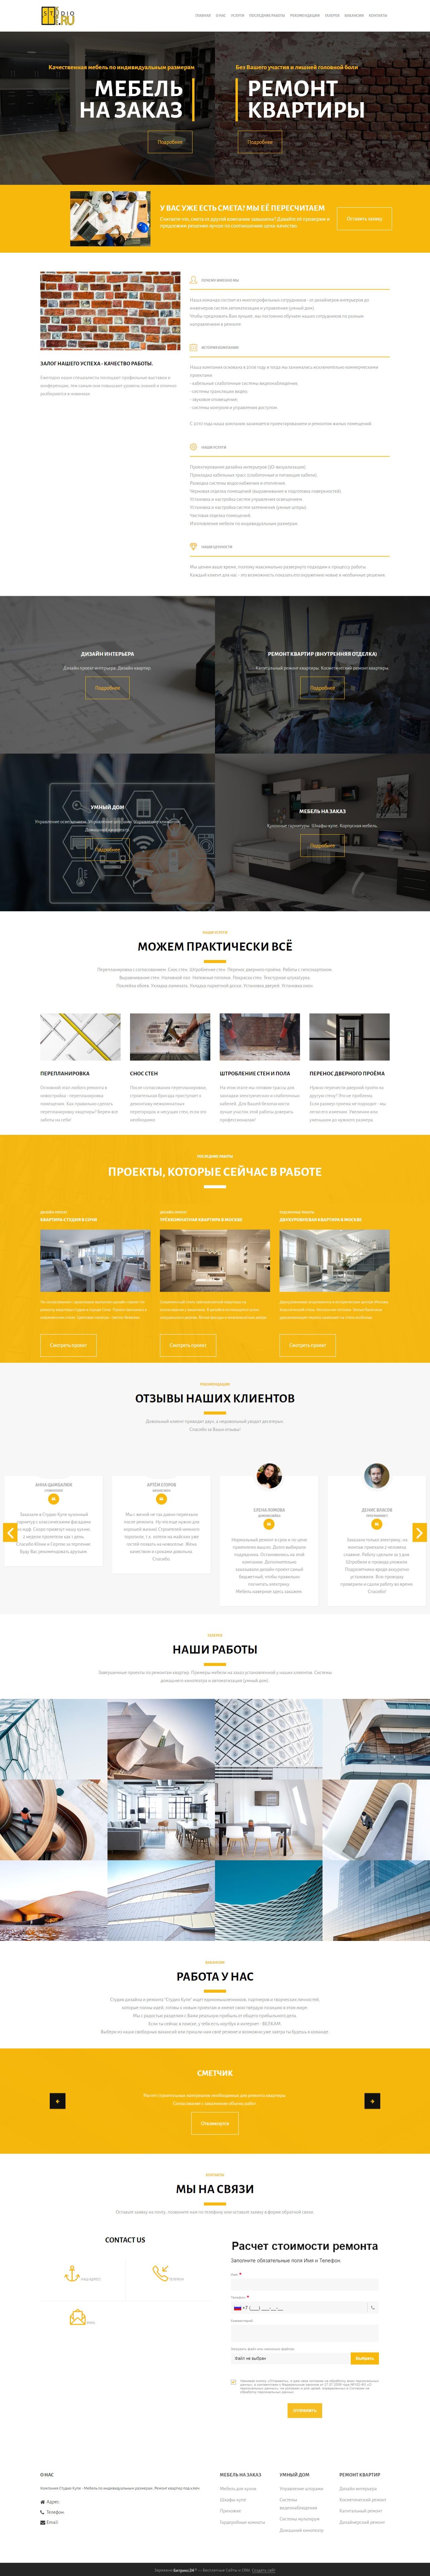 Landing page Studiokupe